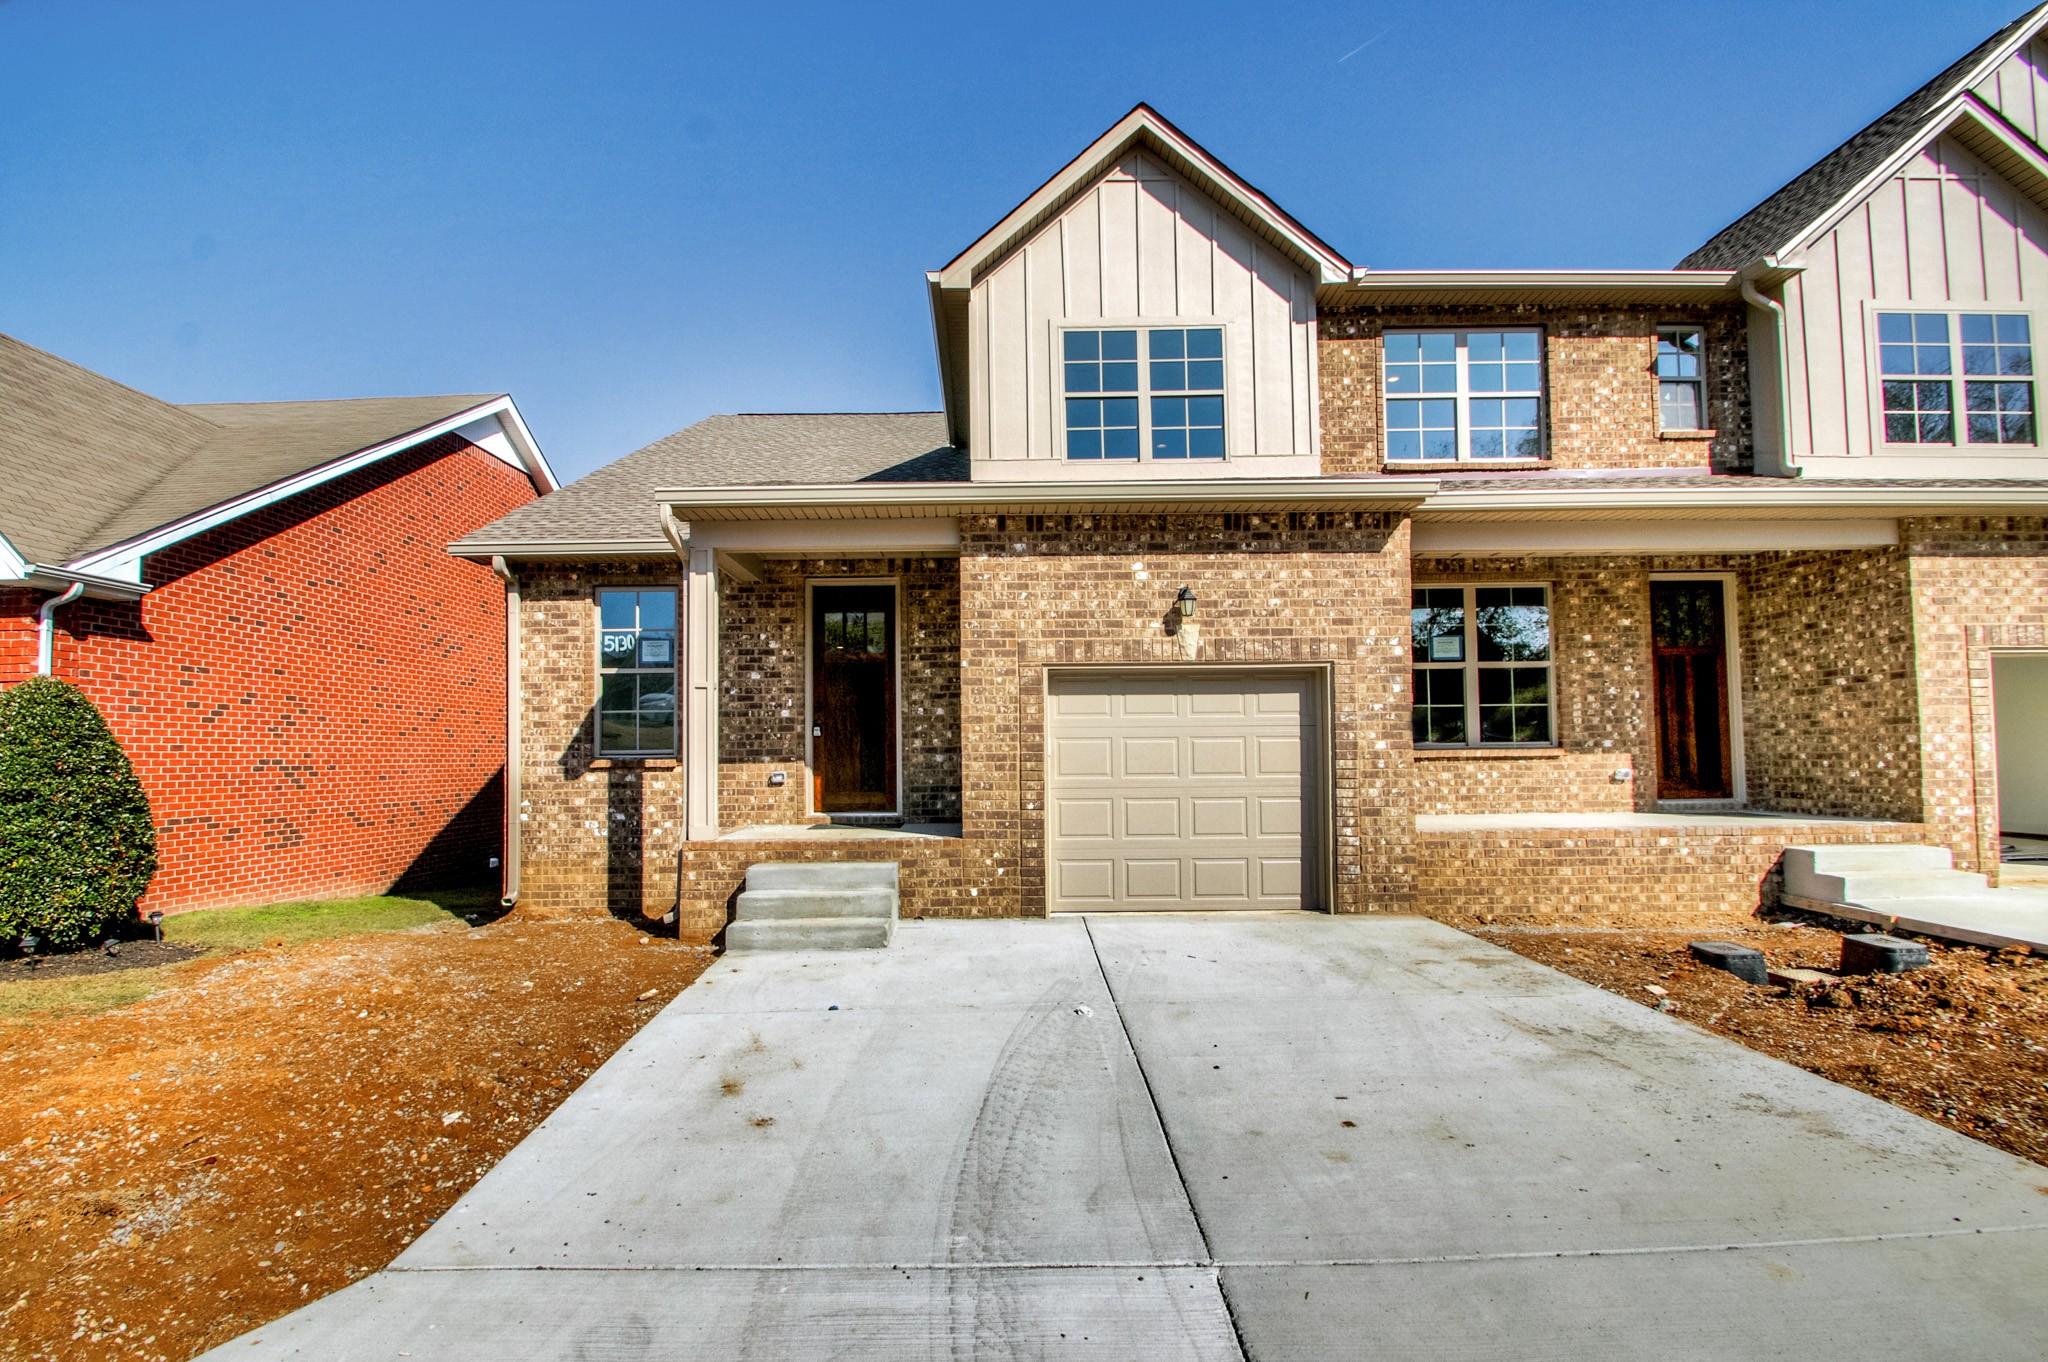 5130 Southfork Blvd, Old Hickory, TN 37138 - Old Hickory, TN real estate listing